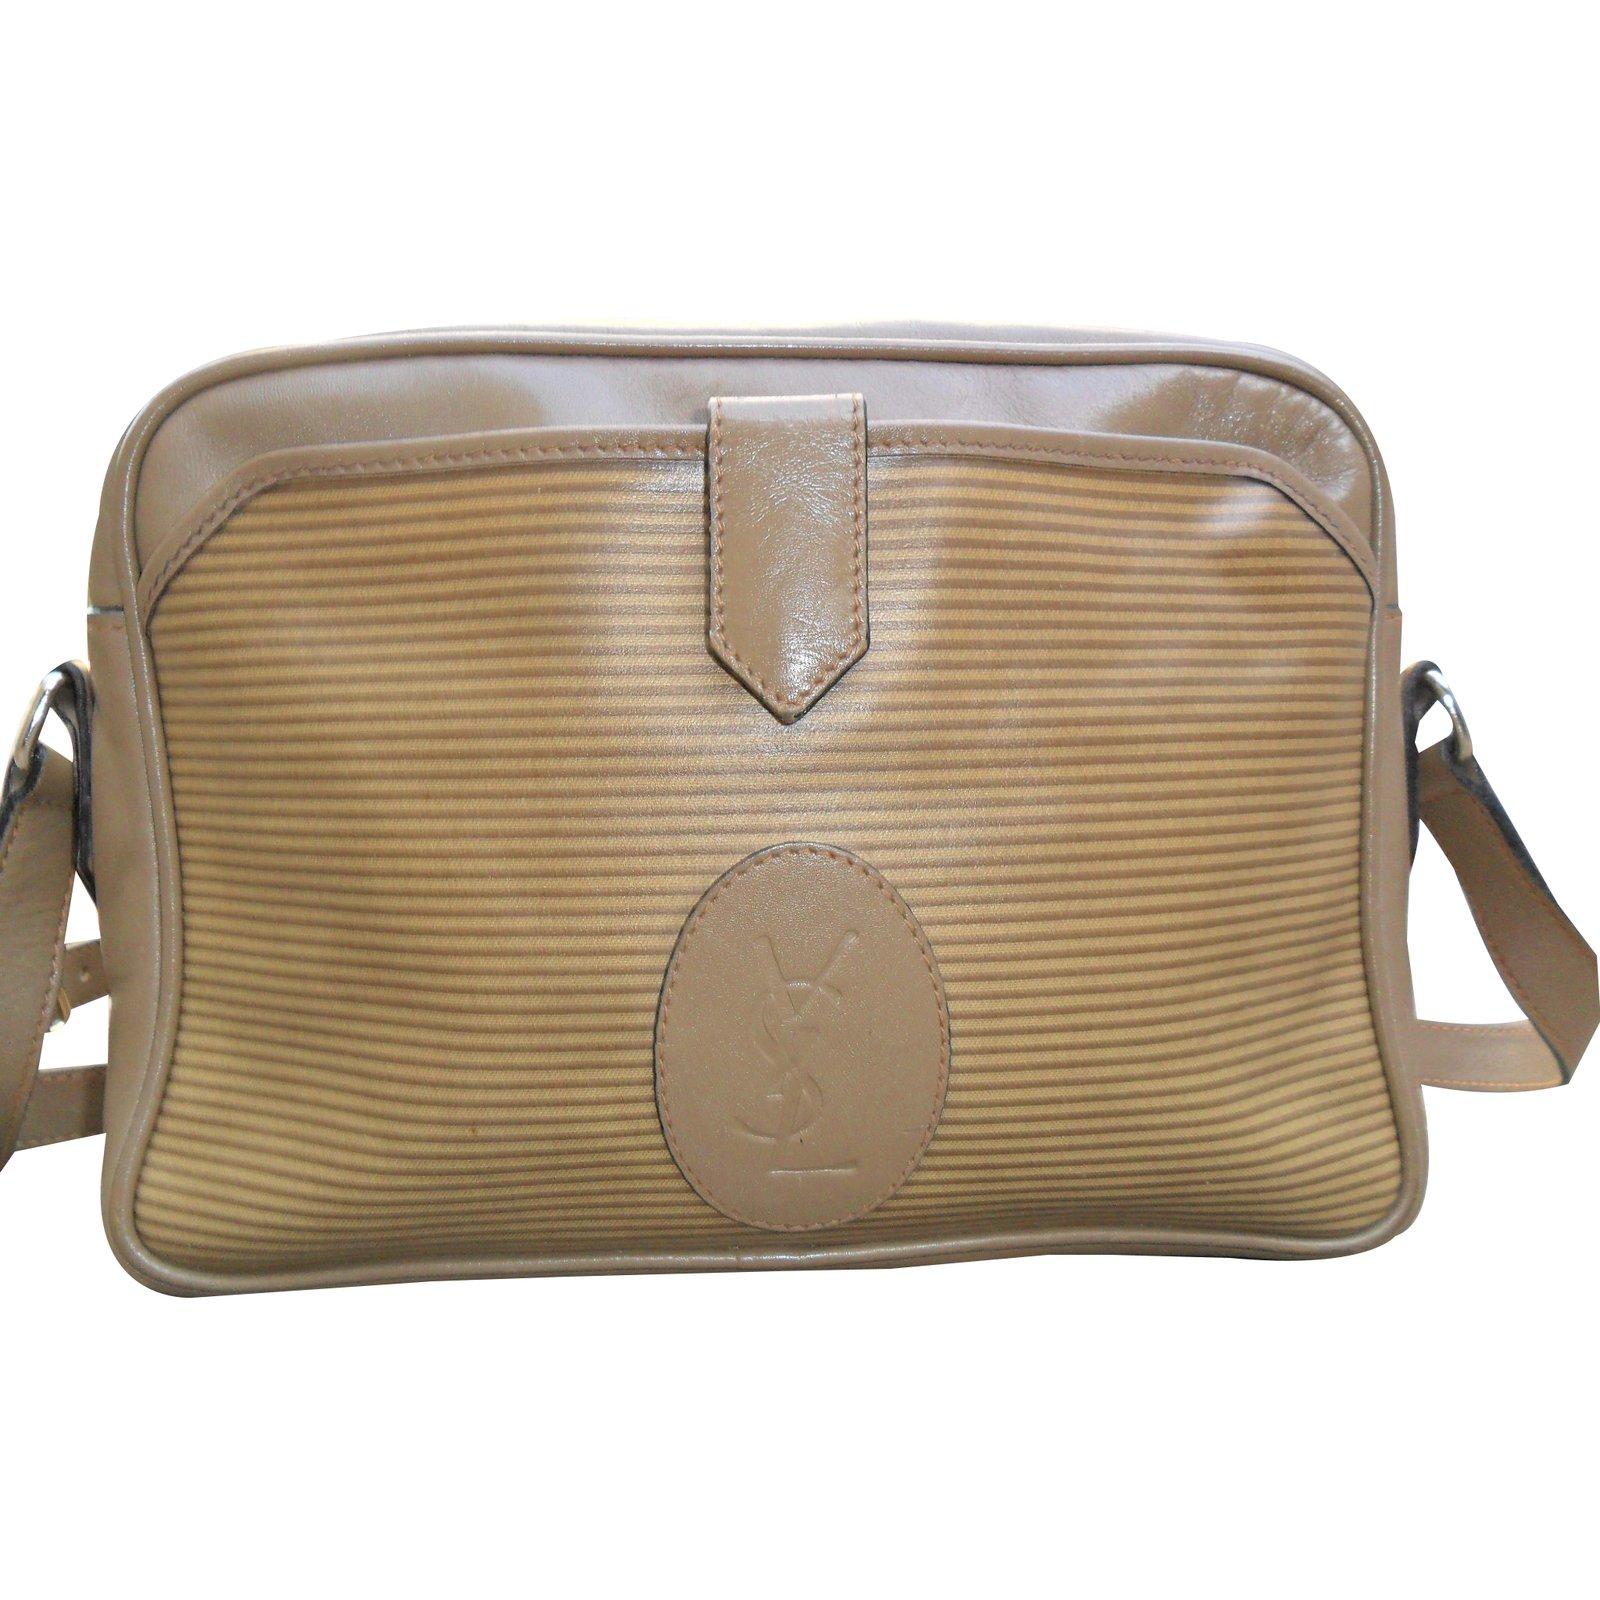 Yves Saint Laurent Handbags Leather Khaki Ref 17946